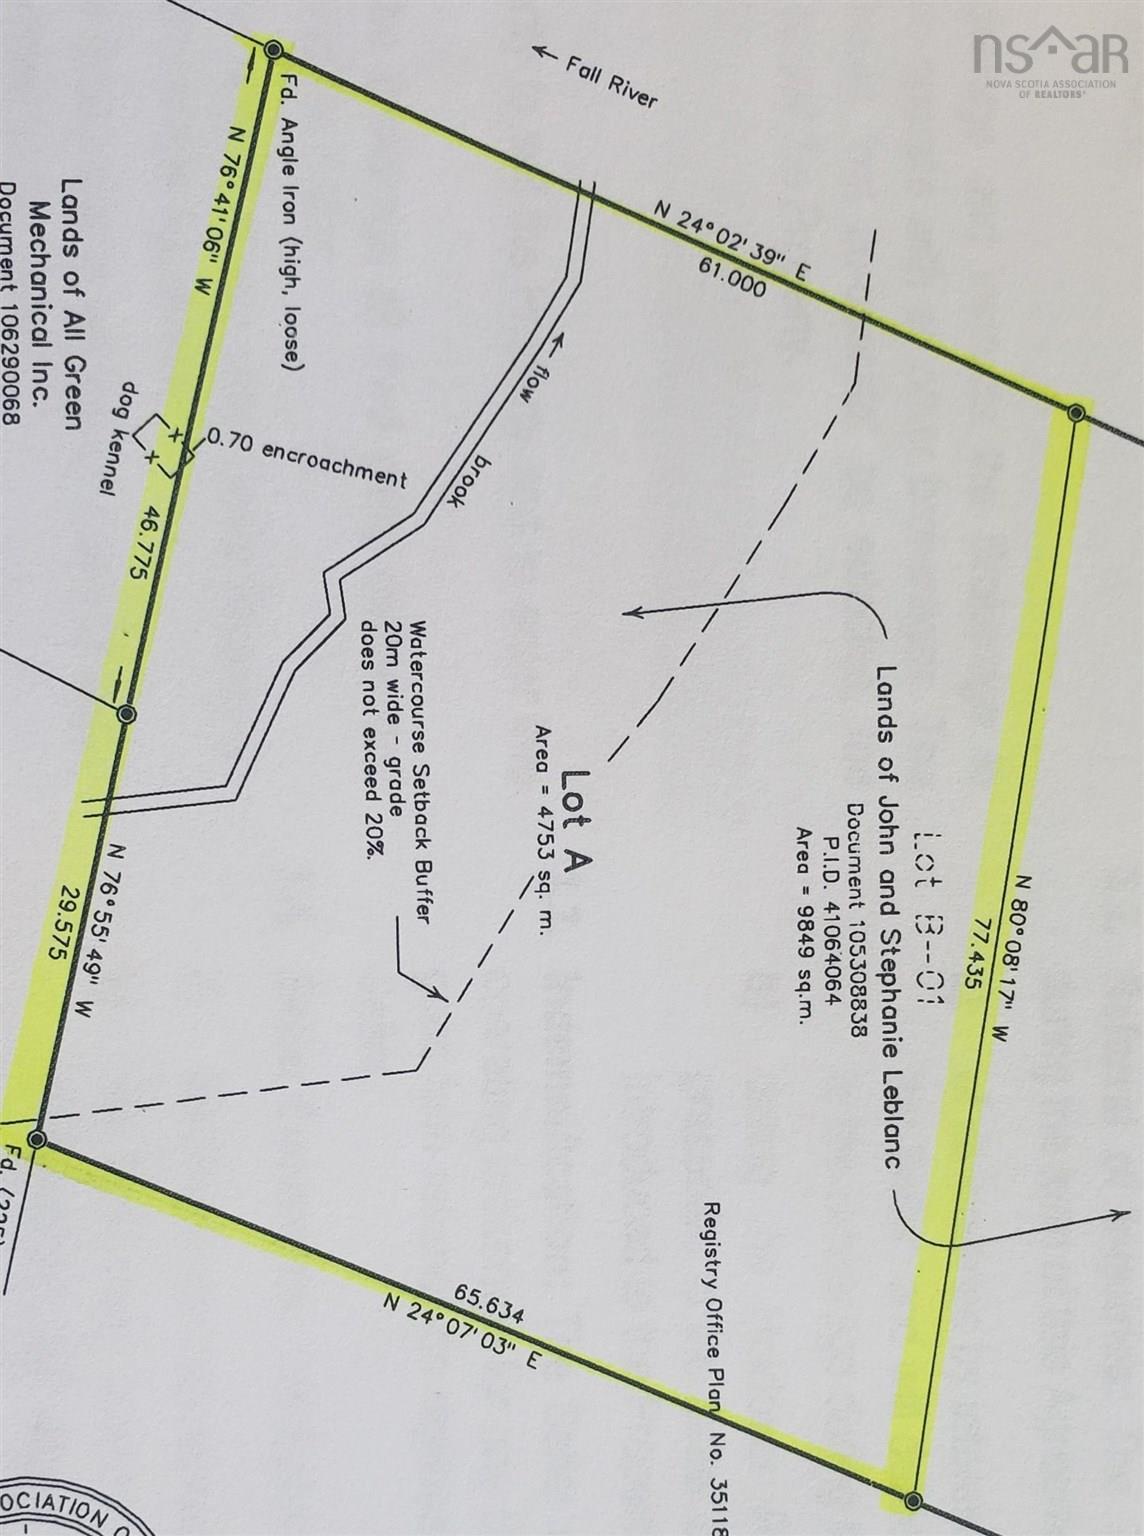 Lot A 4852 Highway 2, Wellington, NS (MLS® 202106438)